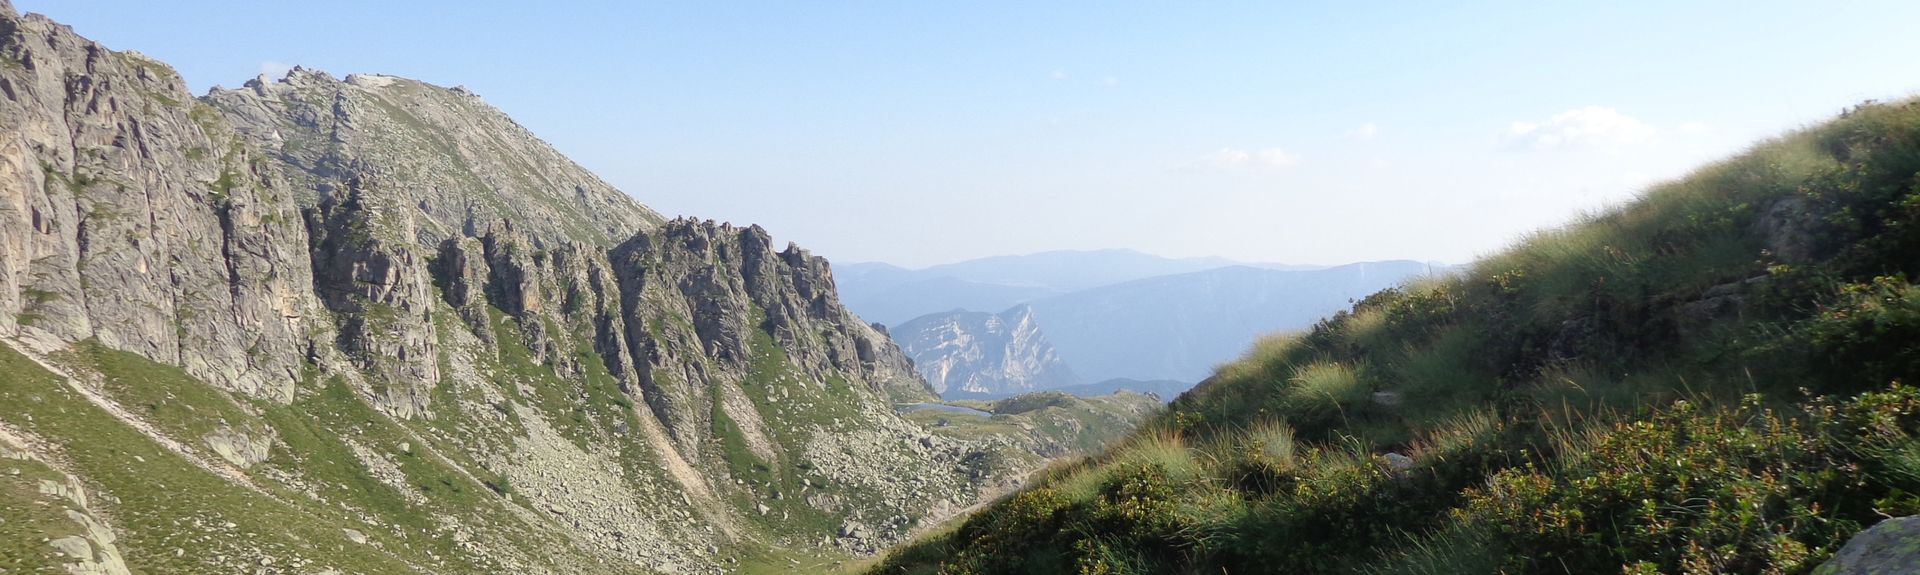 Carzano, Trentino-Alto Adige, Itália